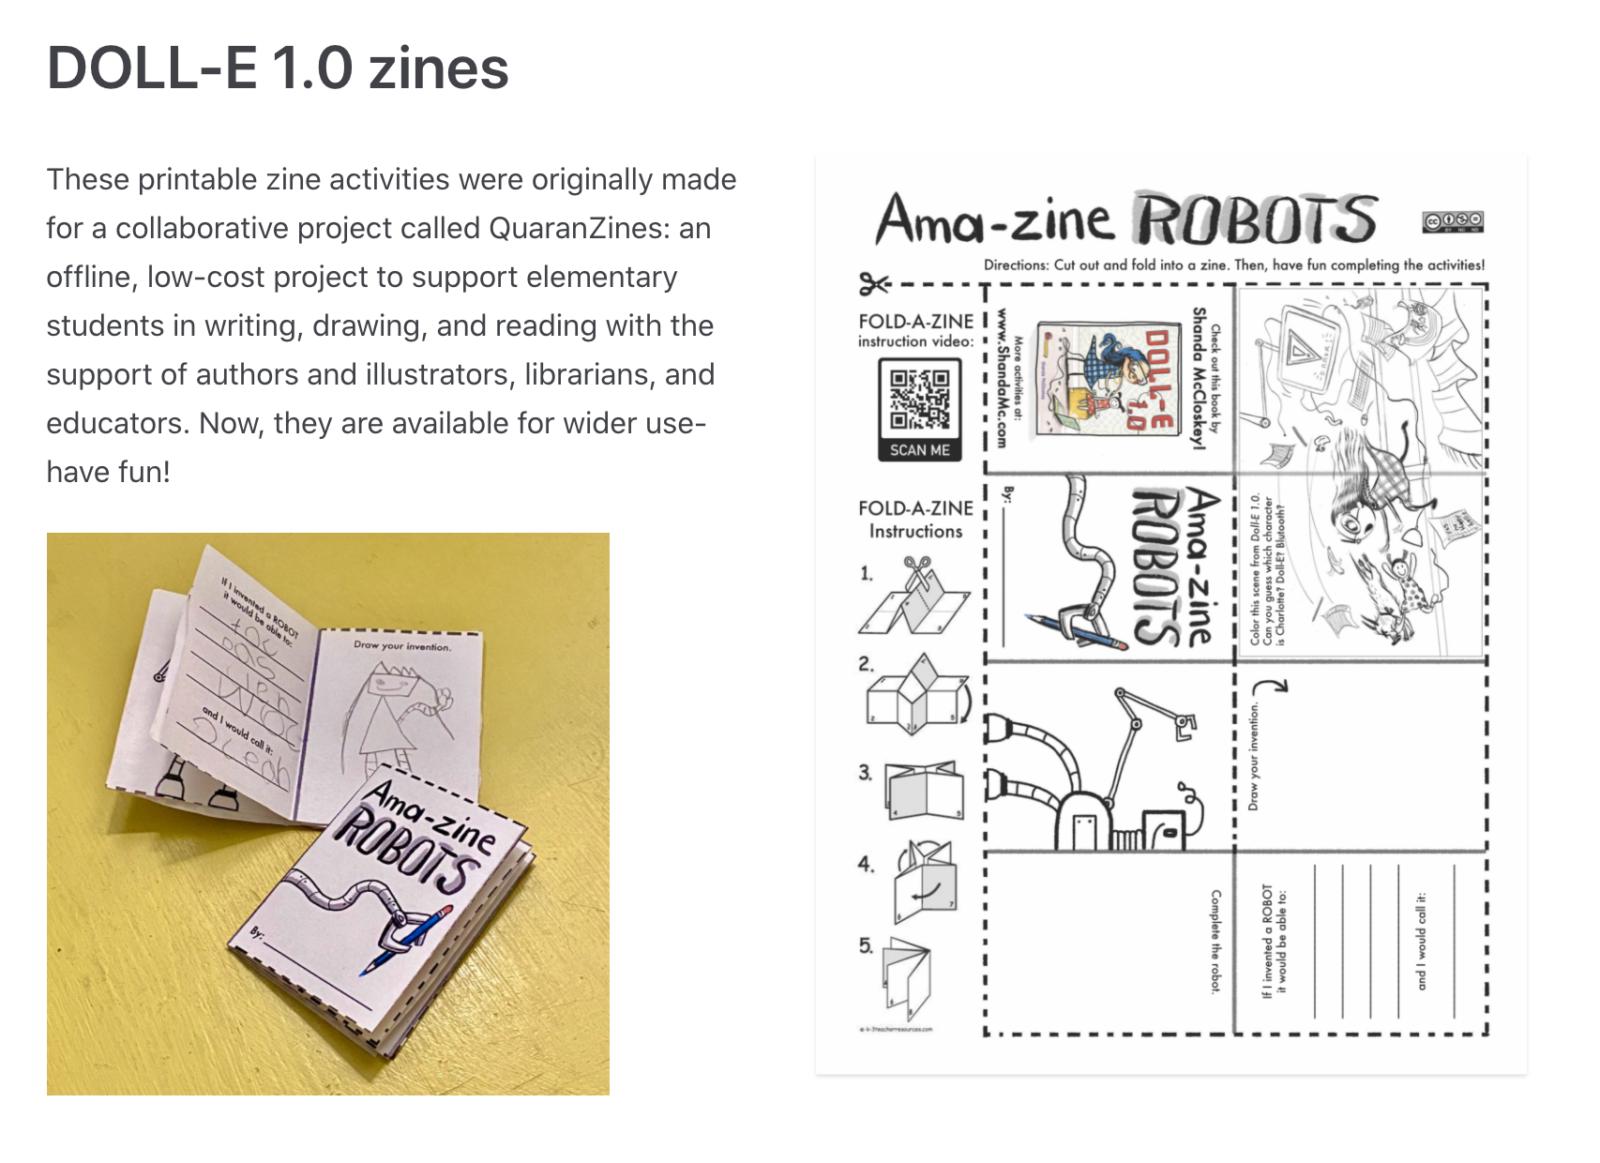 Example of Shanda McCloskey's ROBOT zine.